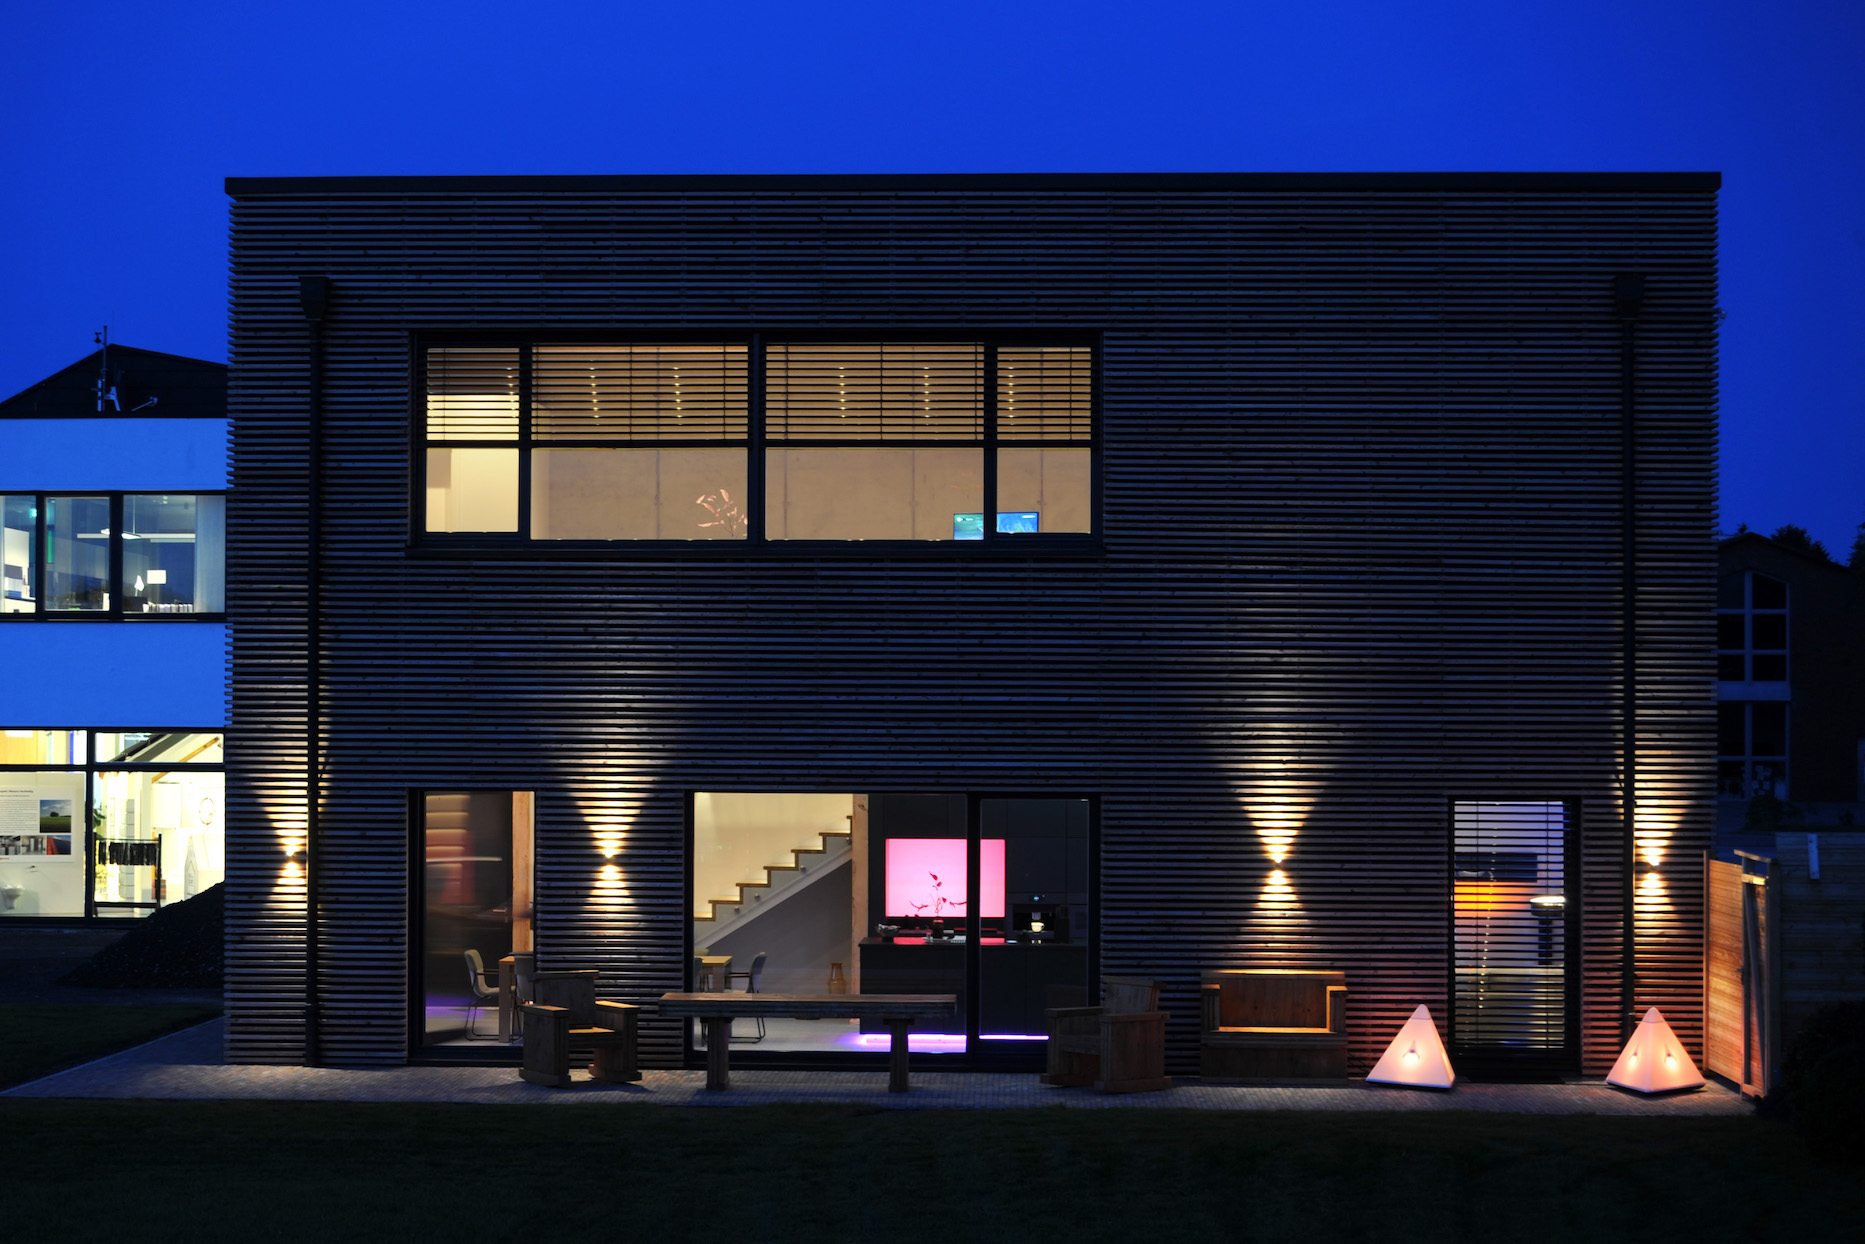 Innenarchitektur webauftritt studio meuleneers krefeld for Innenarchitektur krefeld